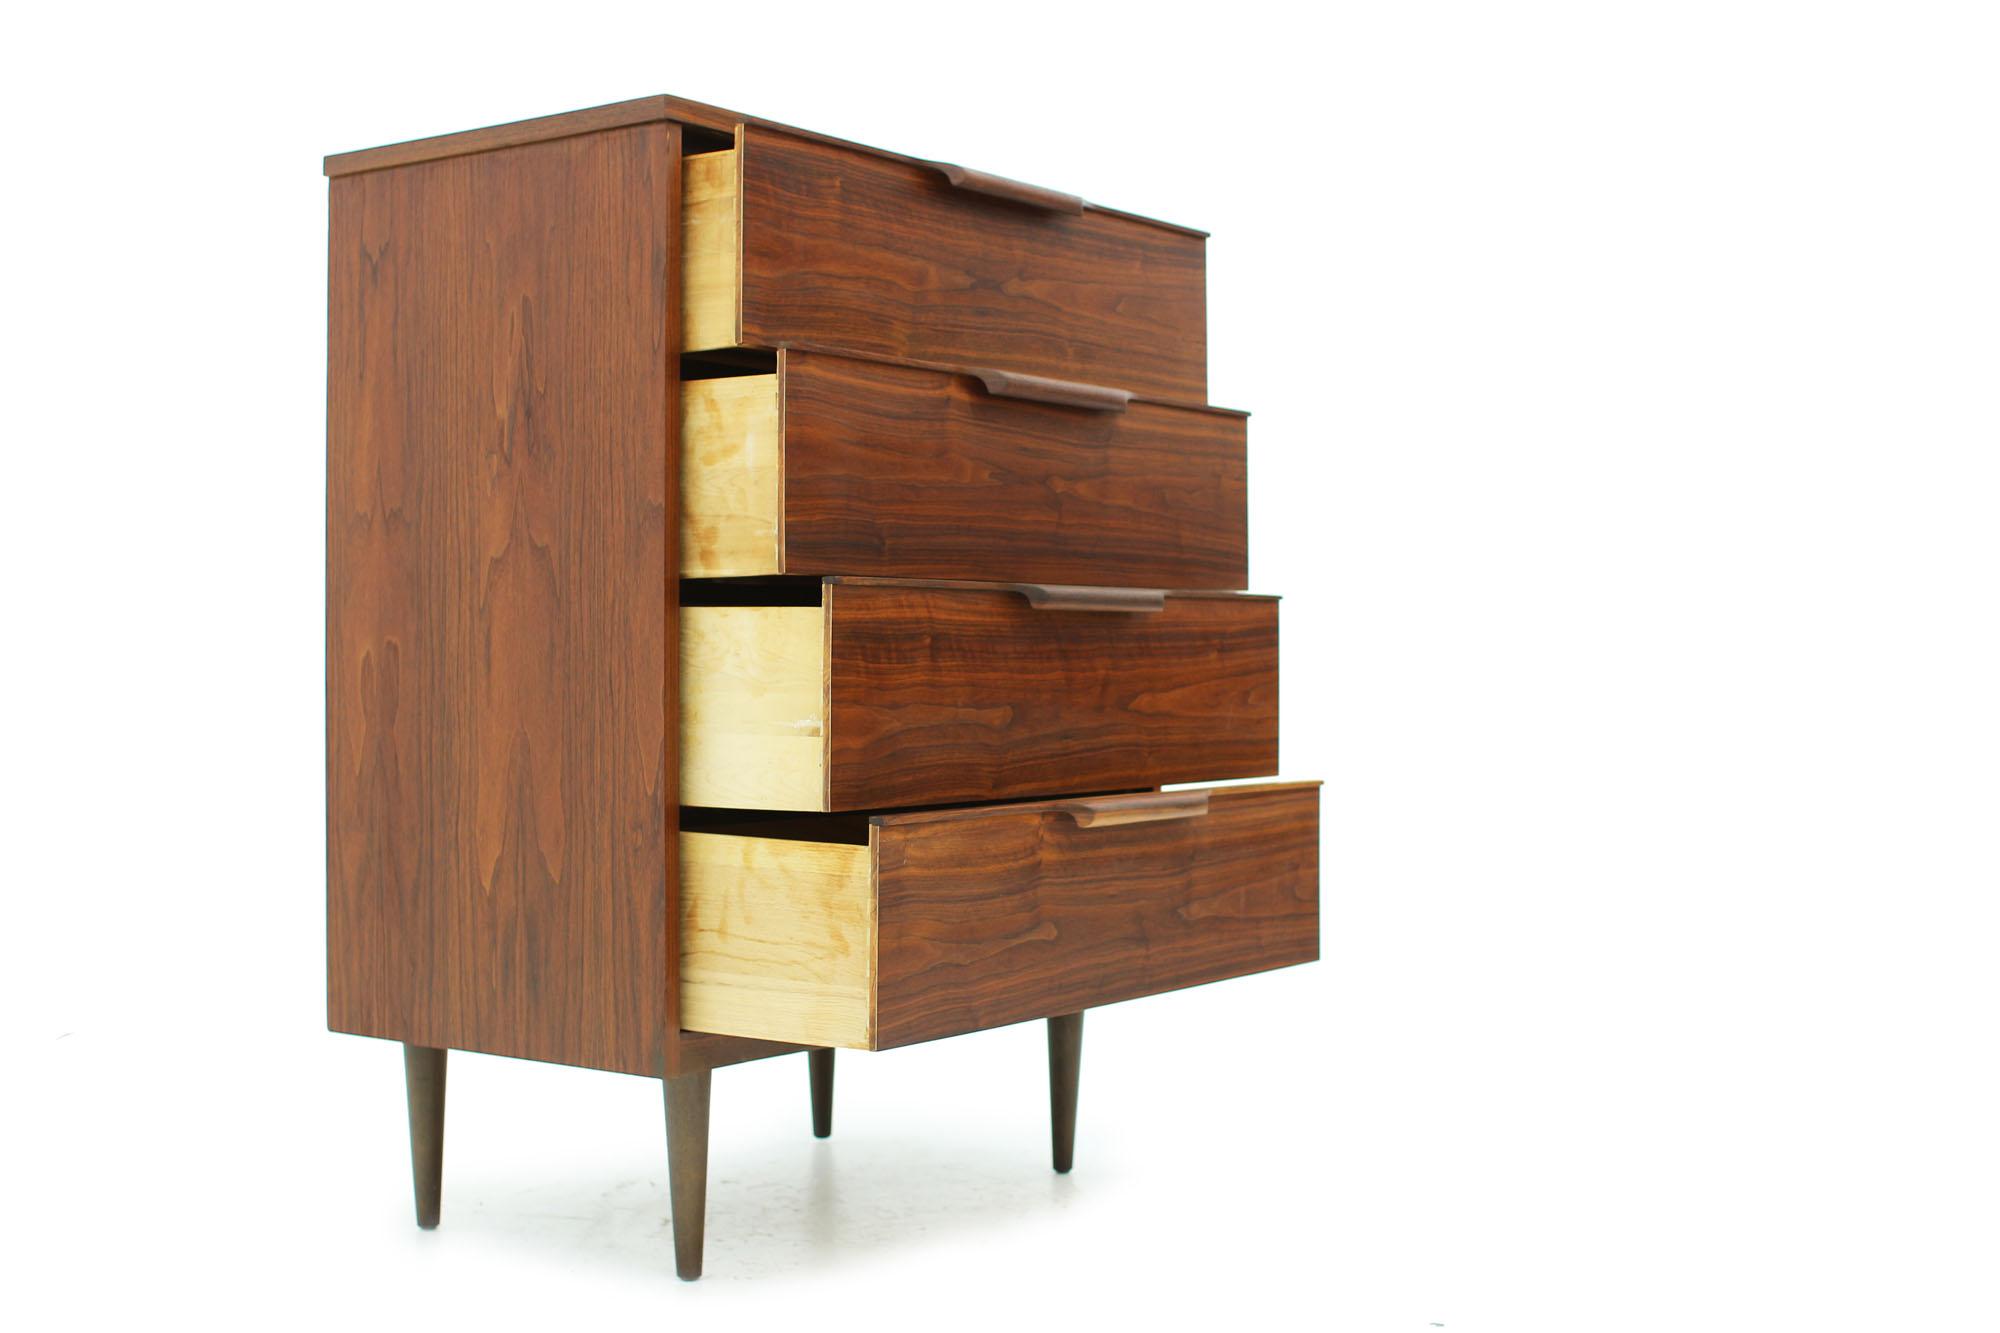 Retro 1960s Walnut Tall Dresser with Sculptural Handles (4).jpg